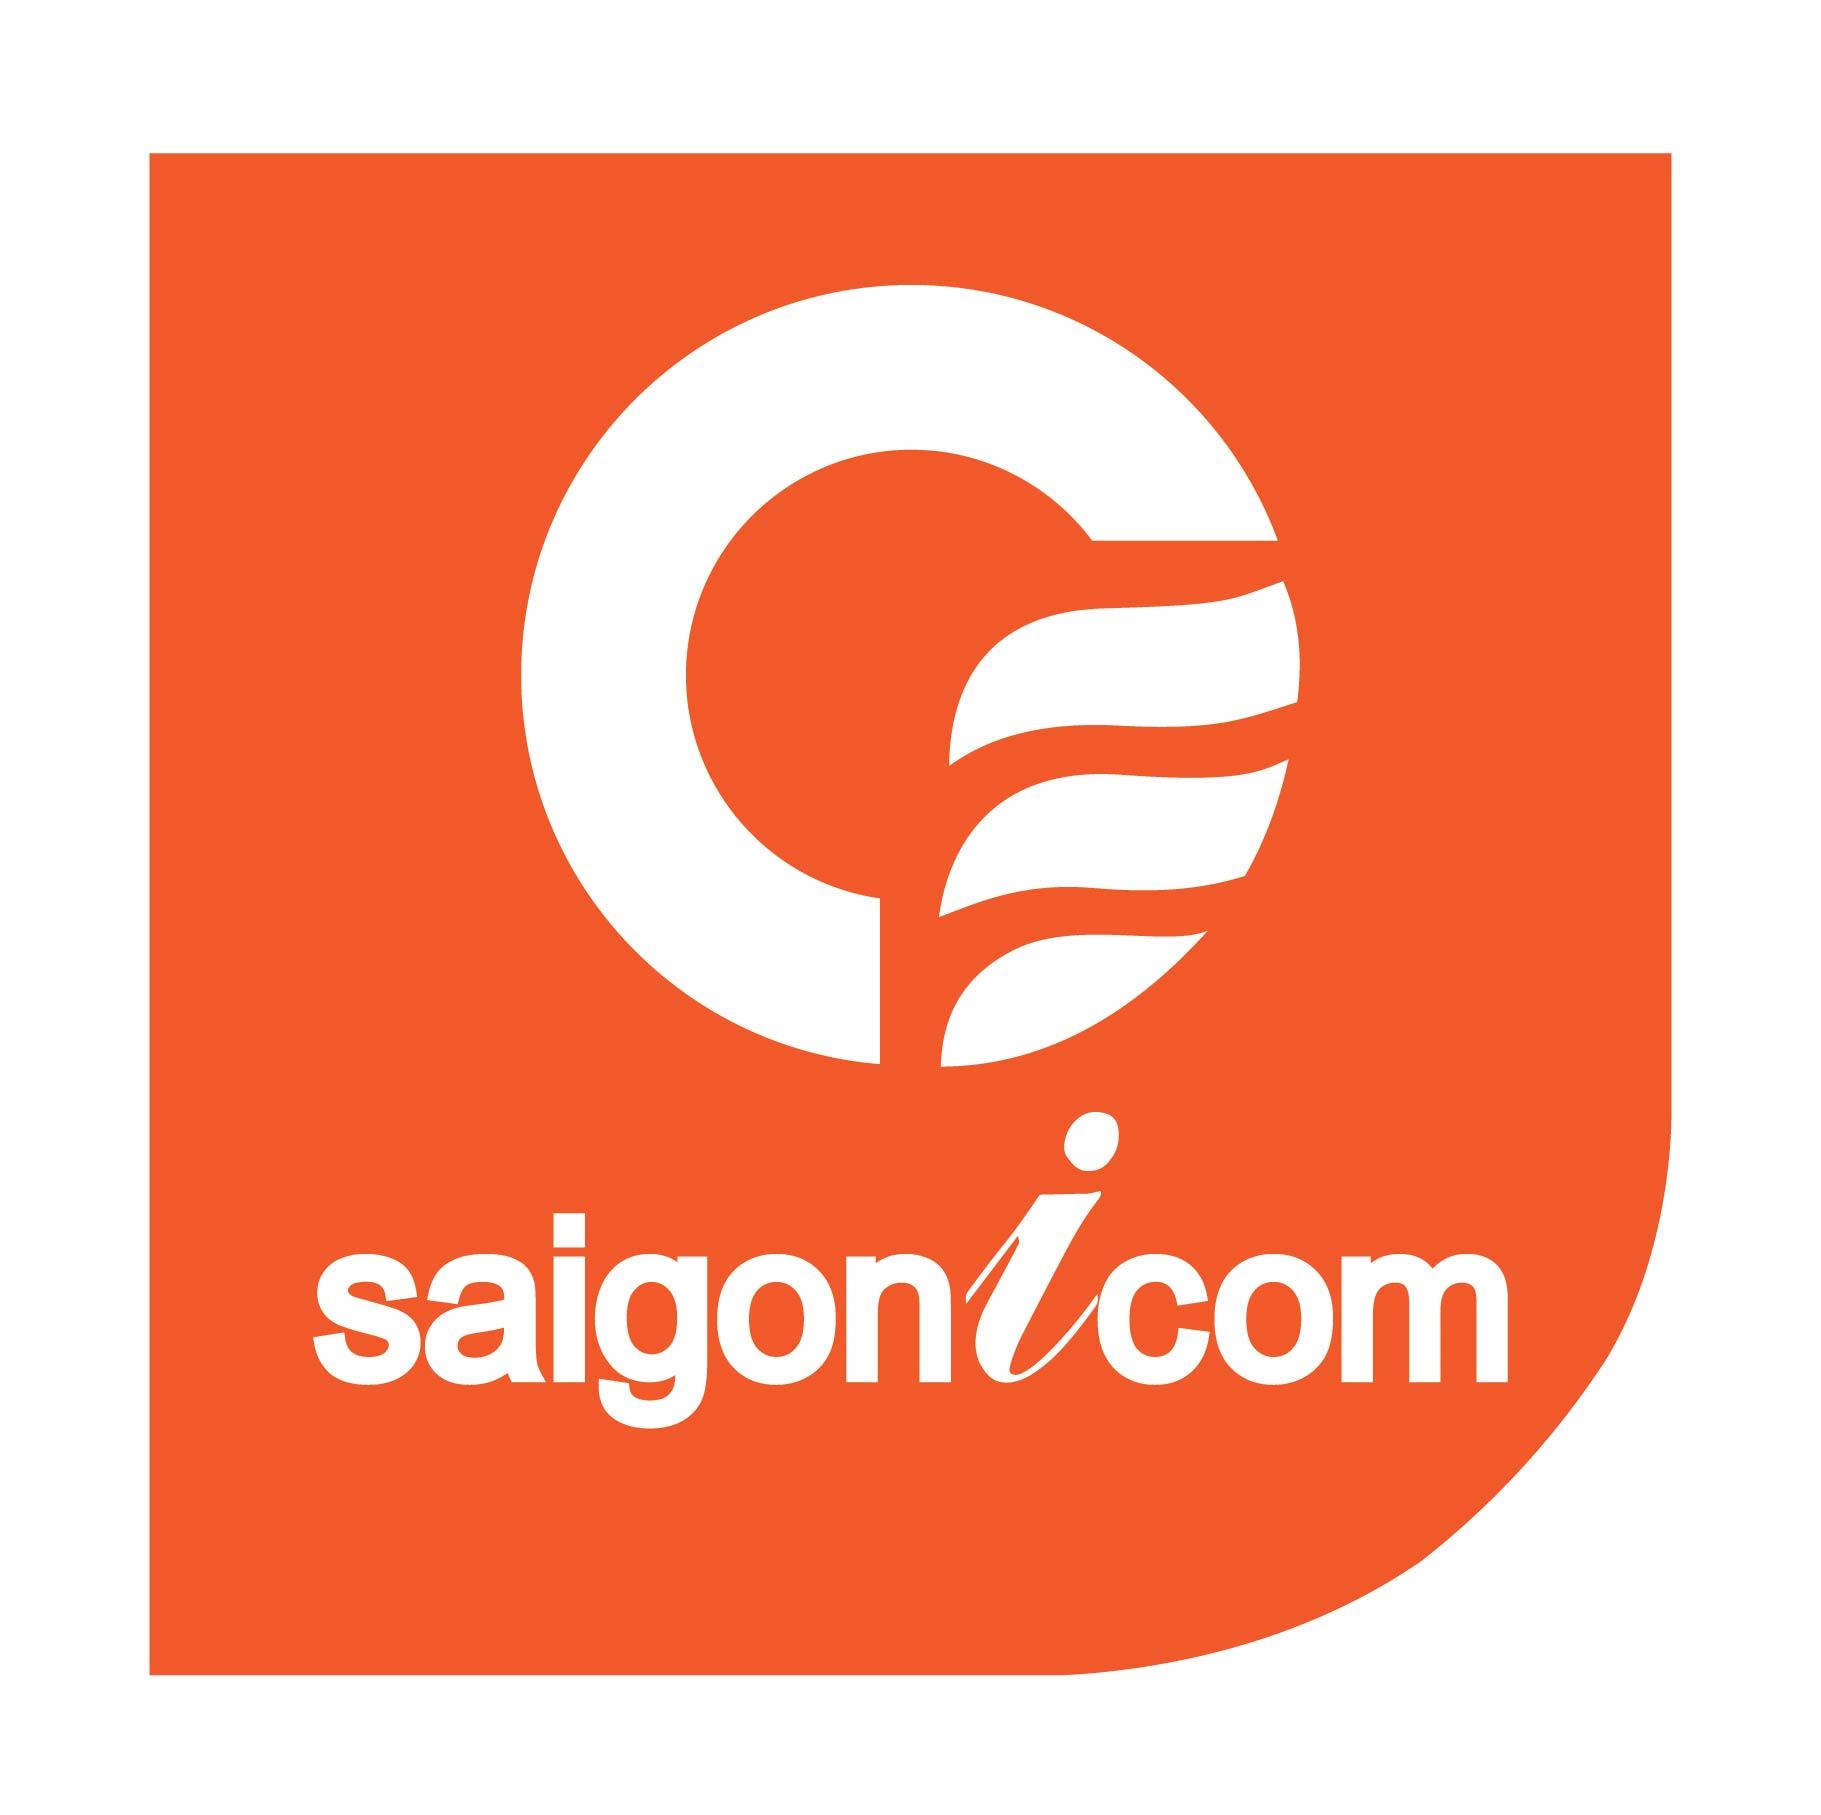 1 SGIC_Logo-01 - Copy (2).